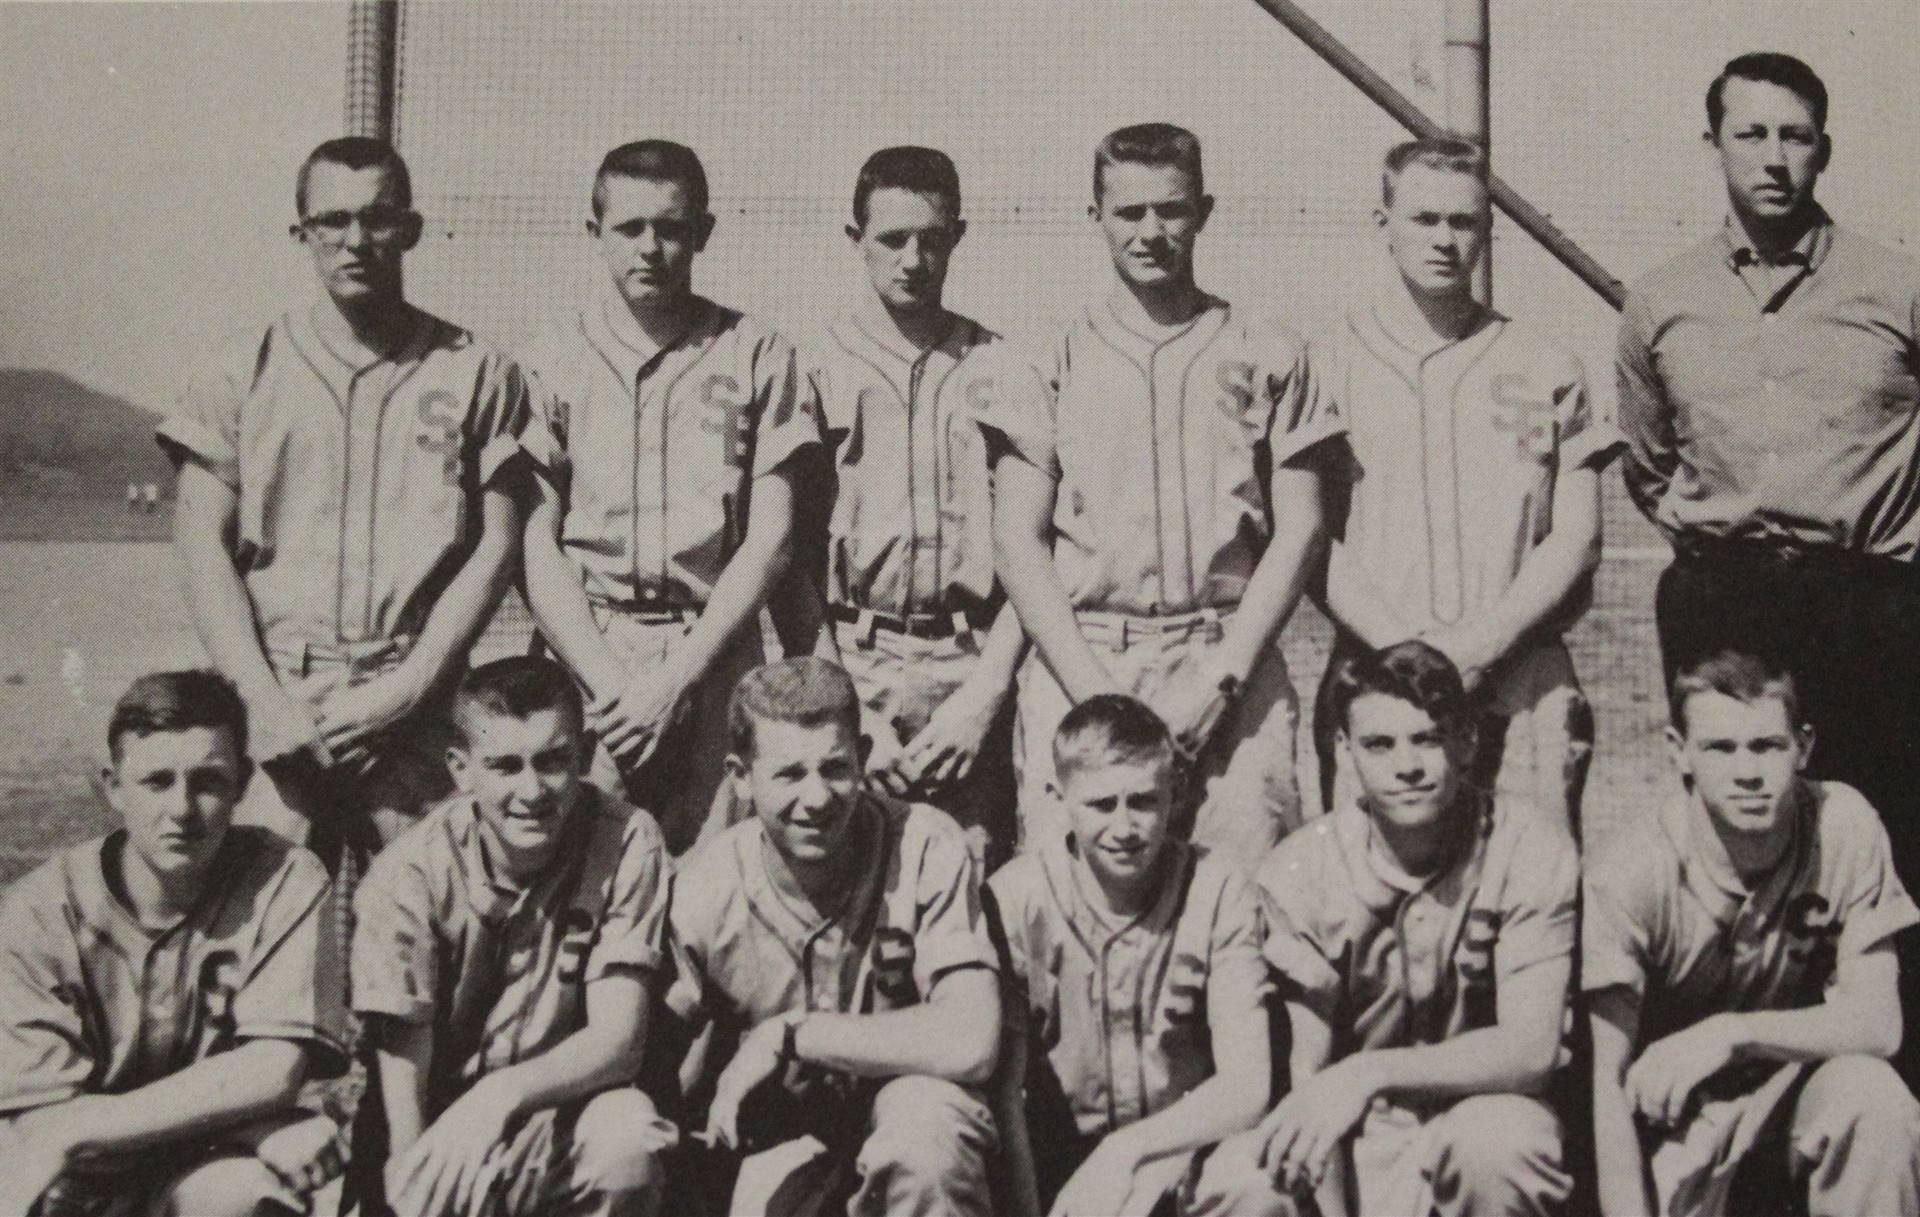 1960 Baseball